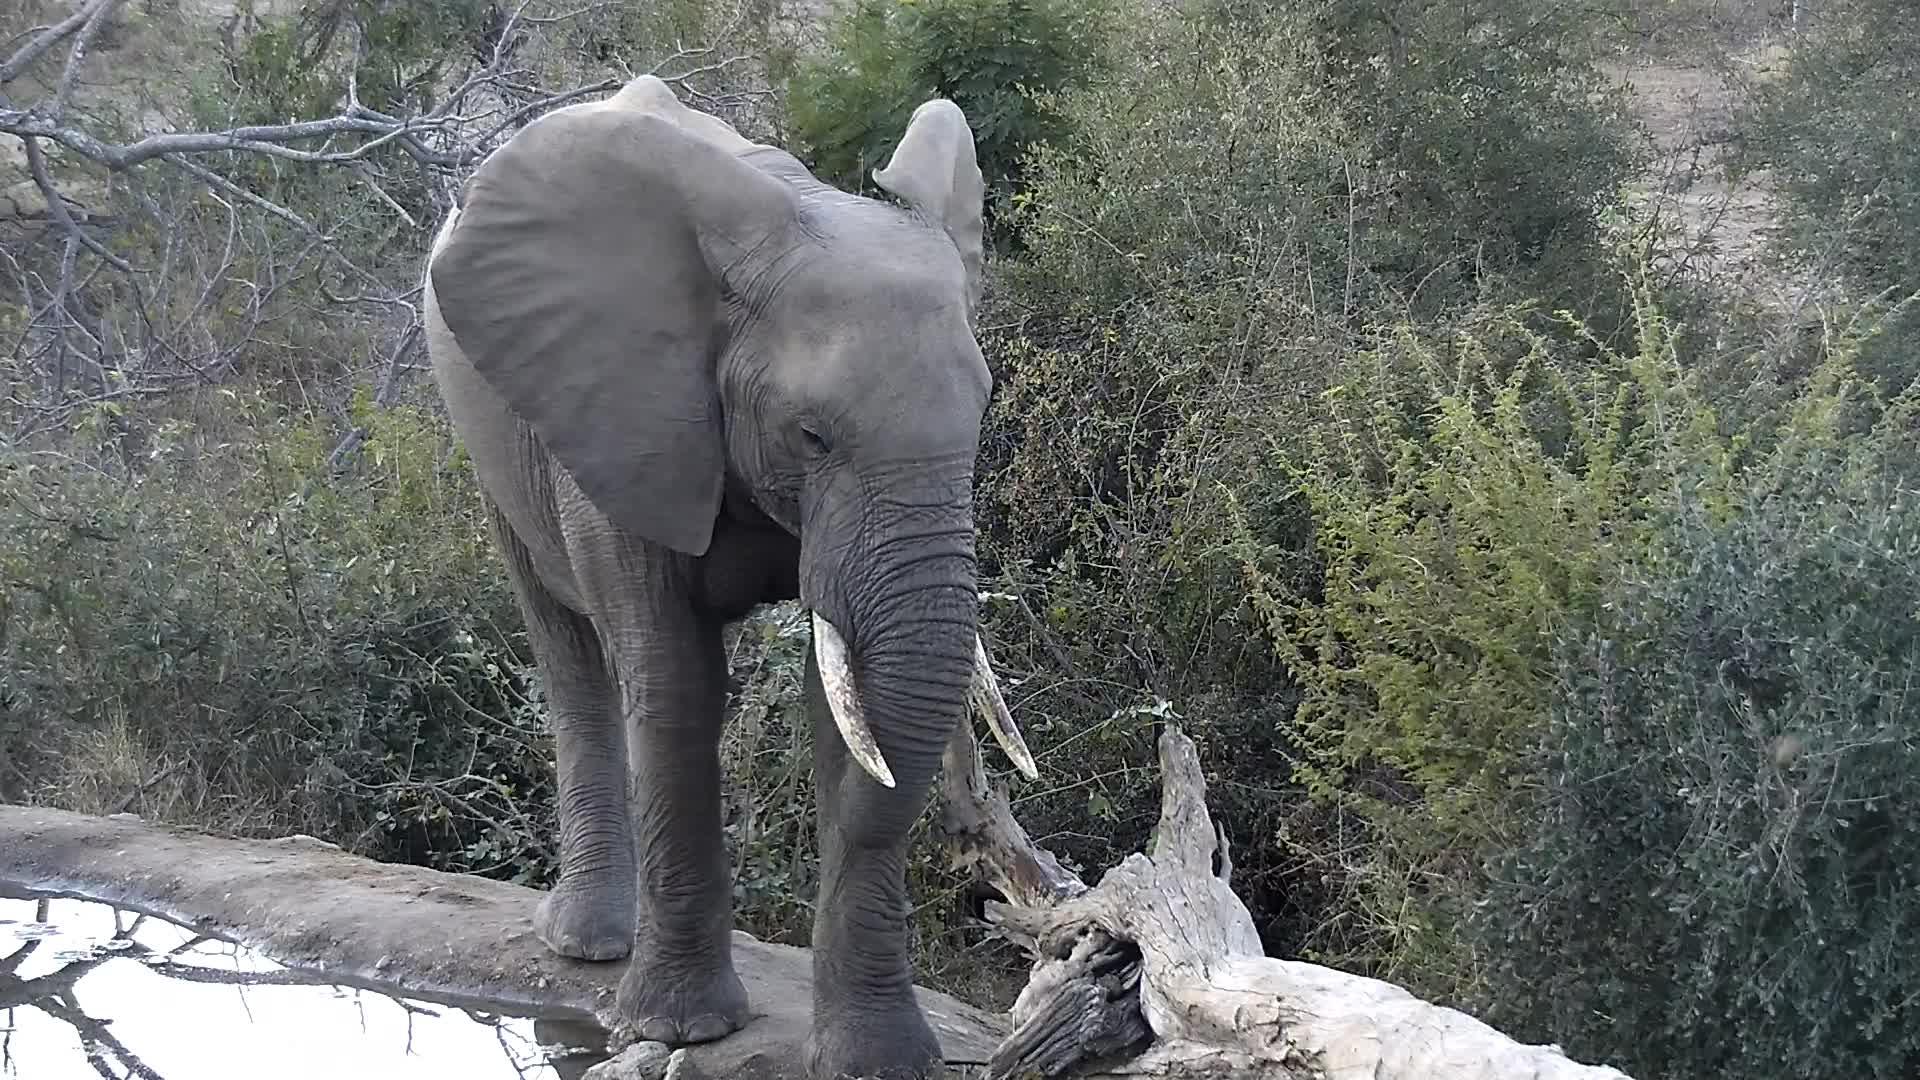 VIDEO: Elephants meeting